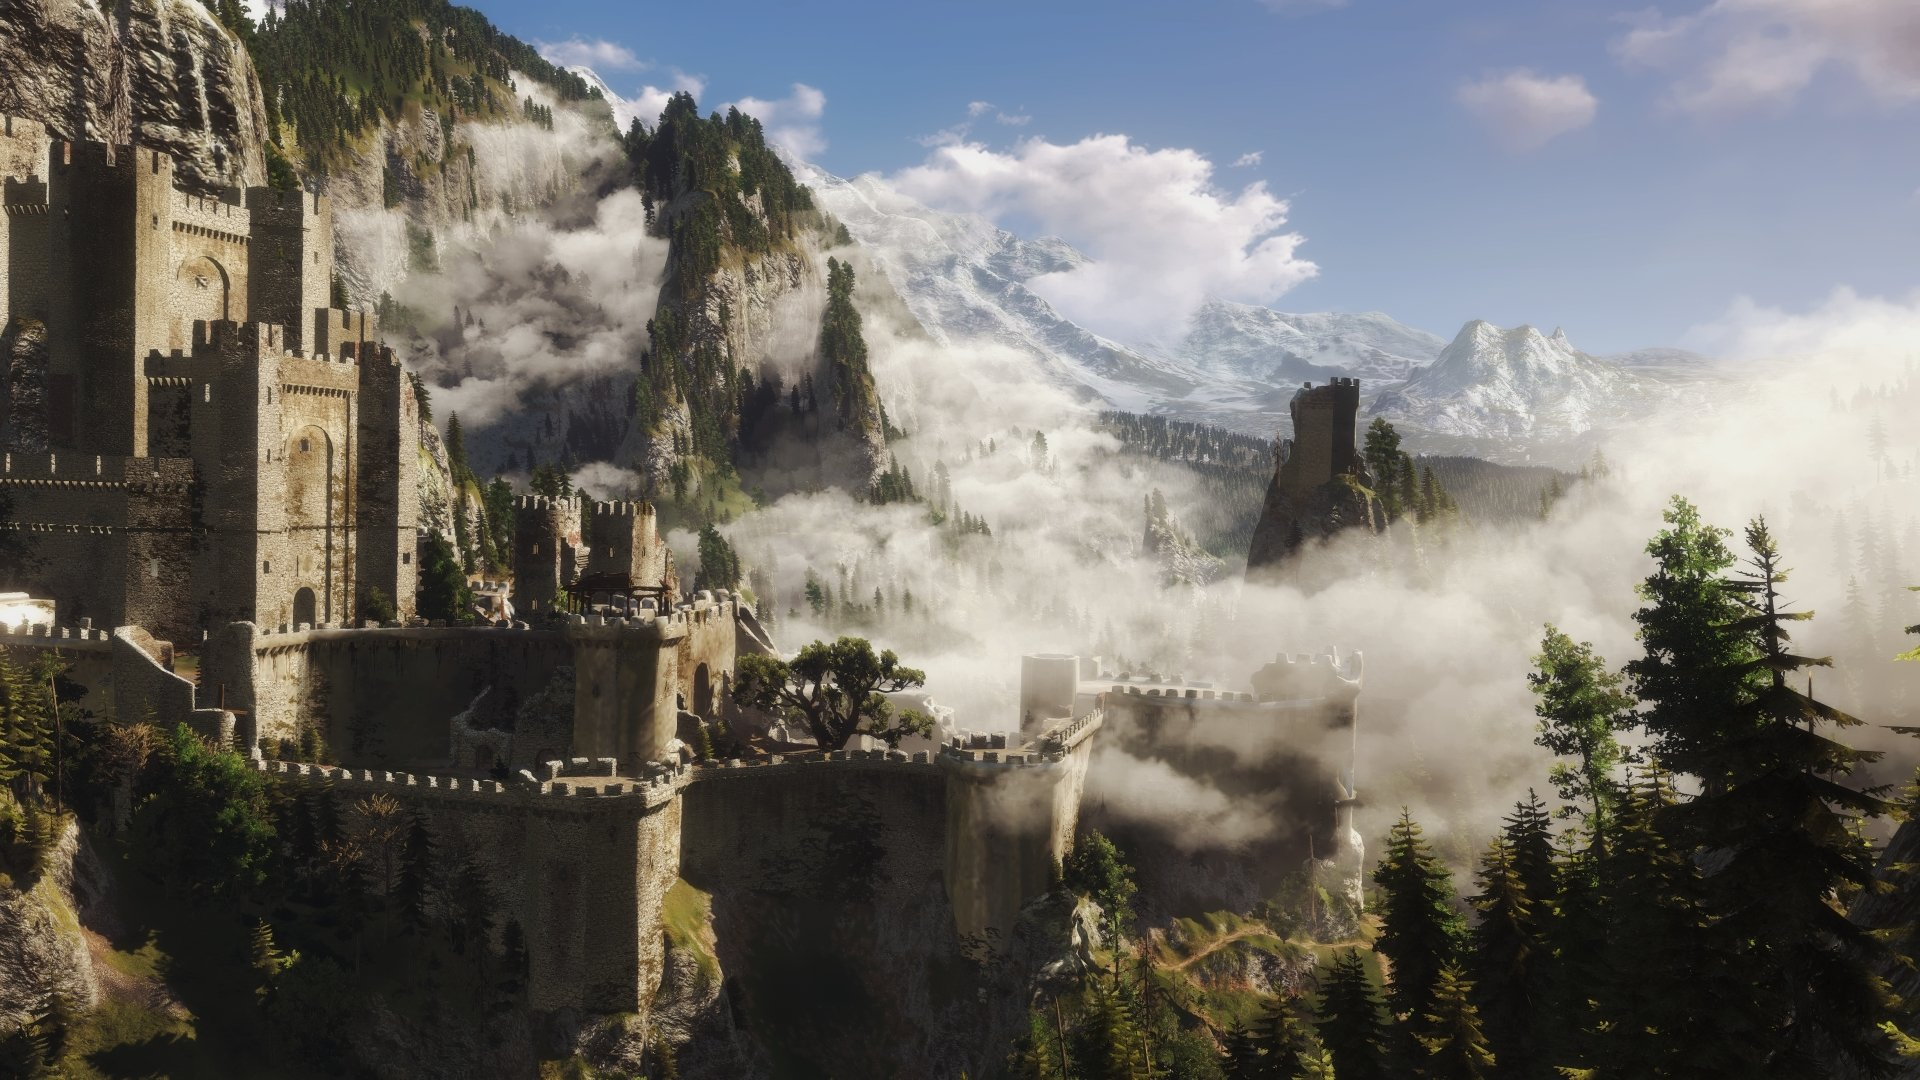 The Witcher 3: Wild Hunt 4k Ultra HD Wallpaper